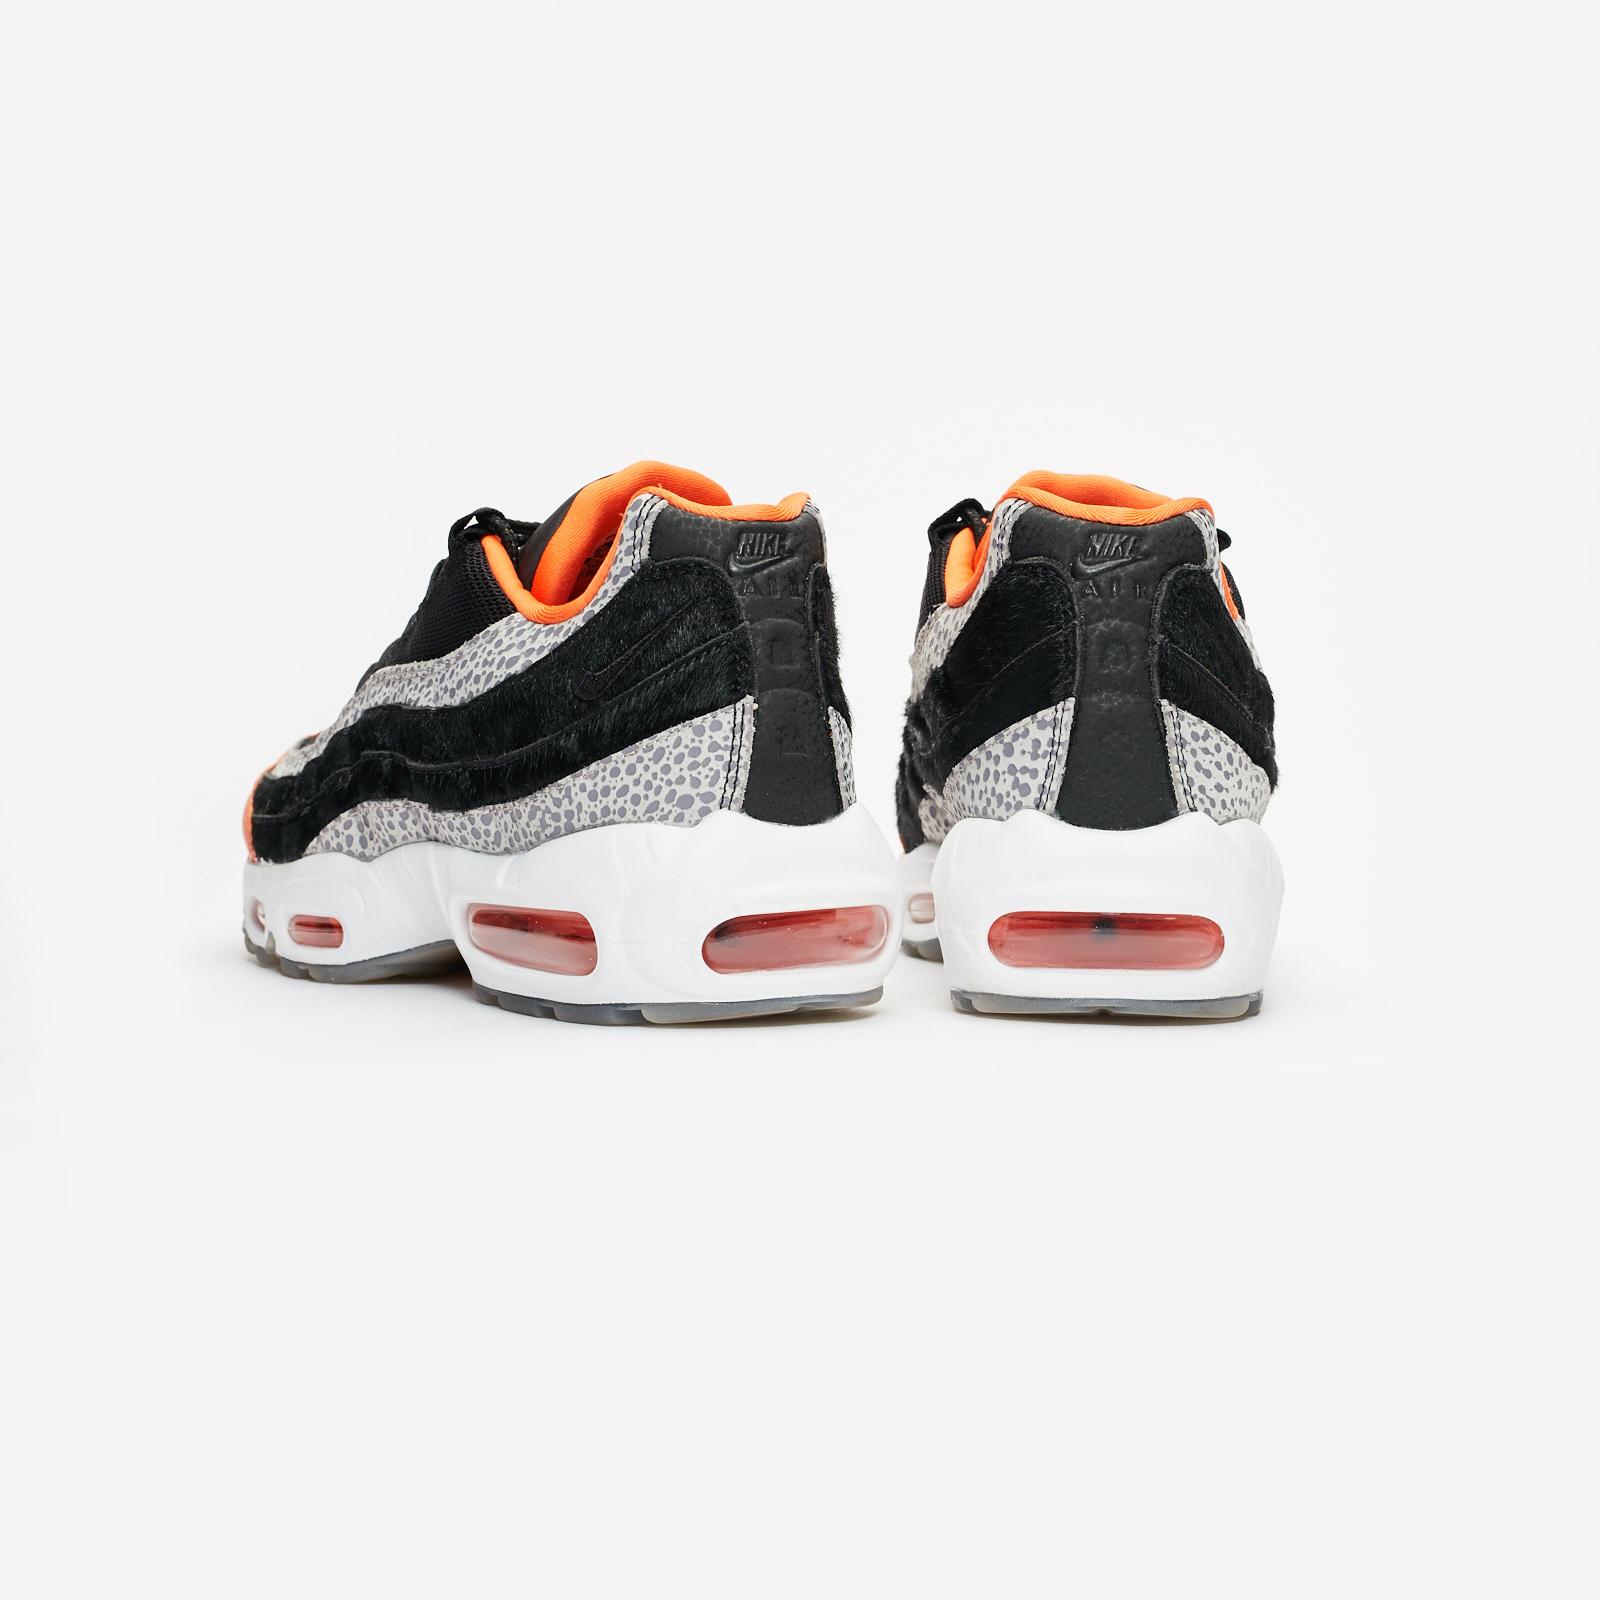 90848f20cc Nike Air Max 95 - Av7014-002 - Sneakersnstuff | sneakers & streetwear  online since 1999